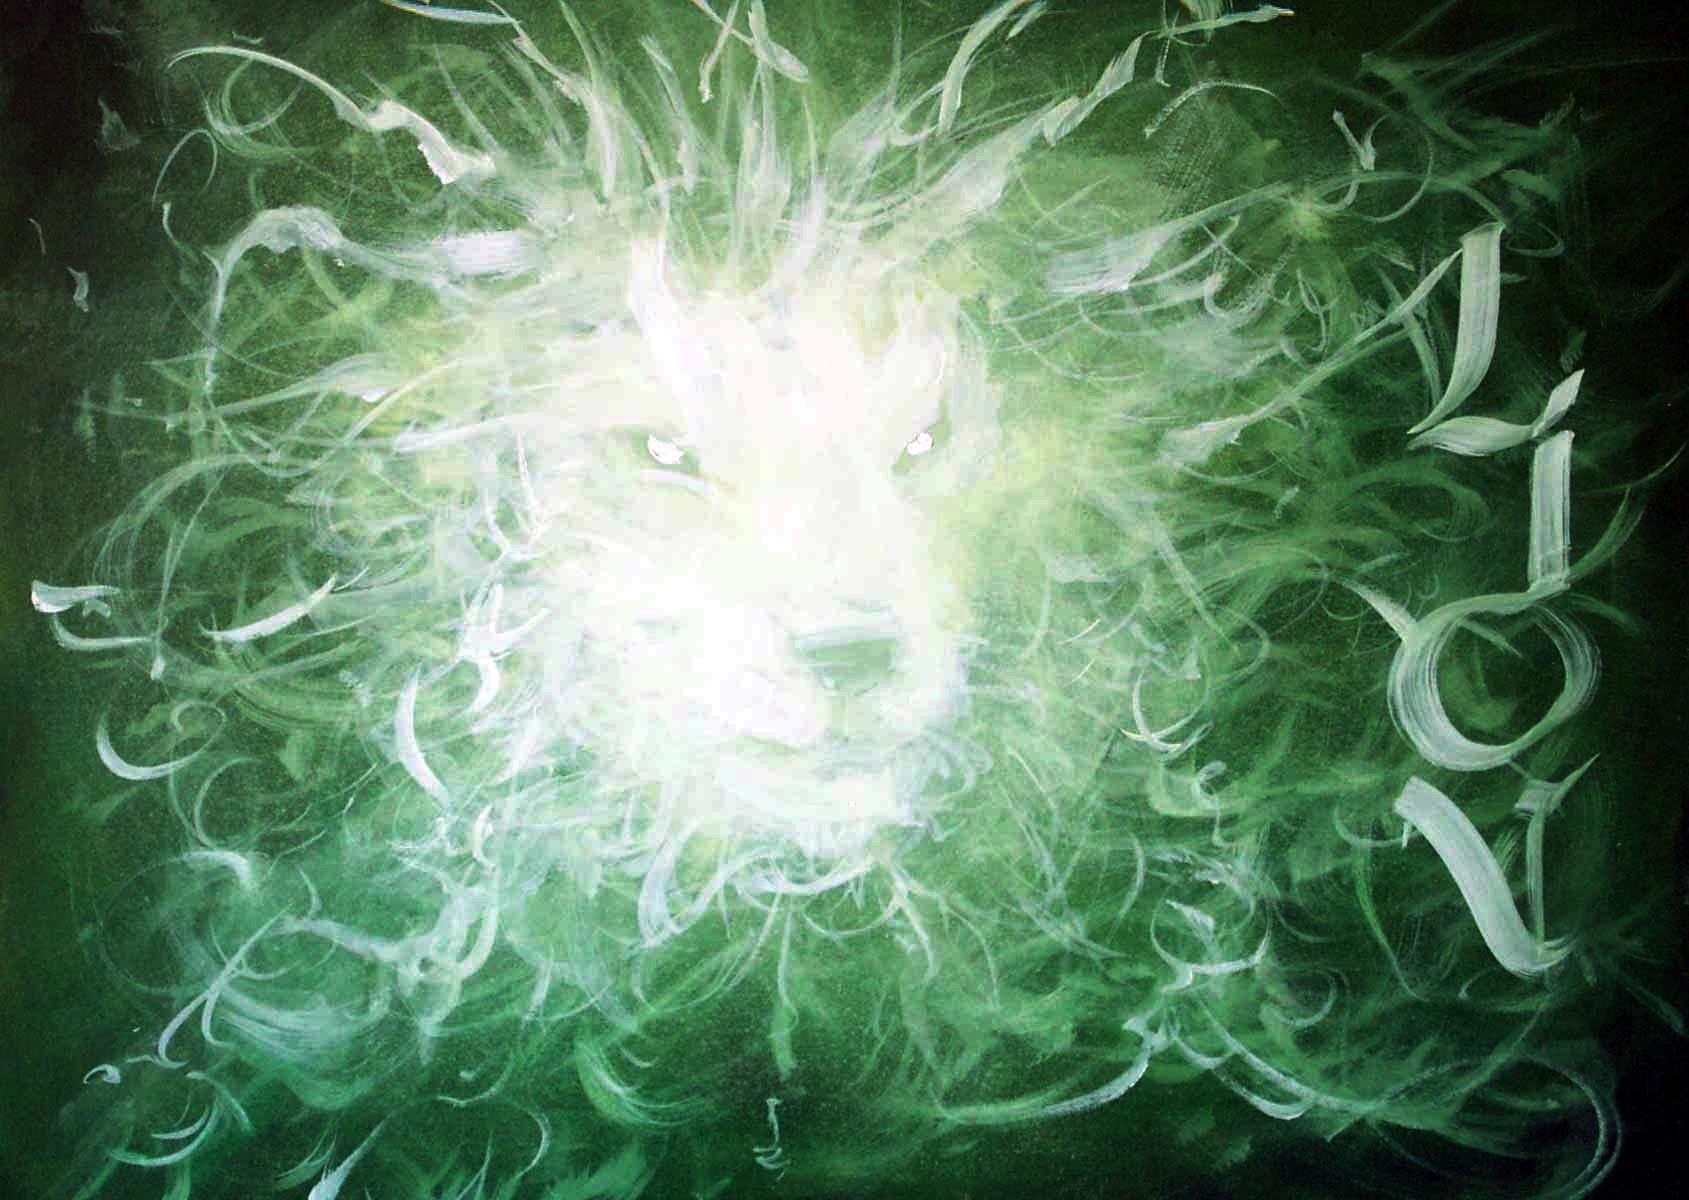 du lion synonyme